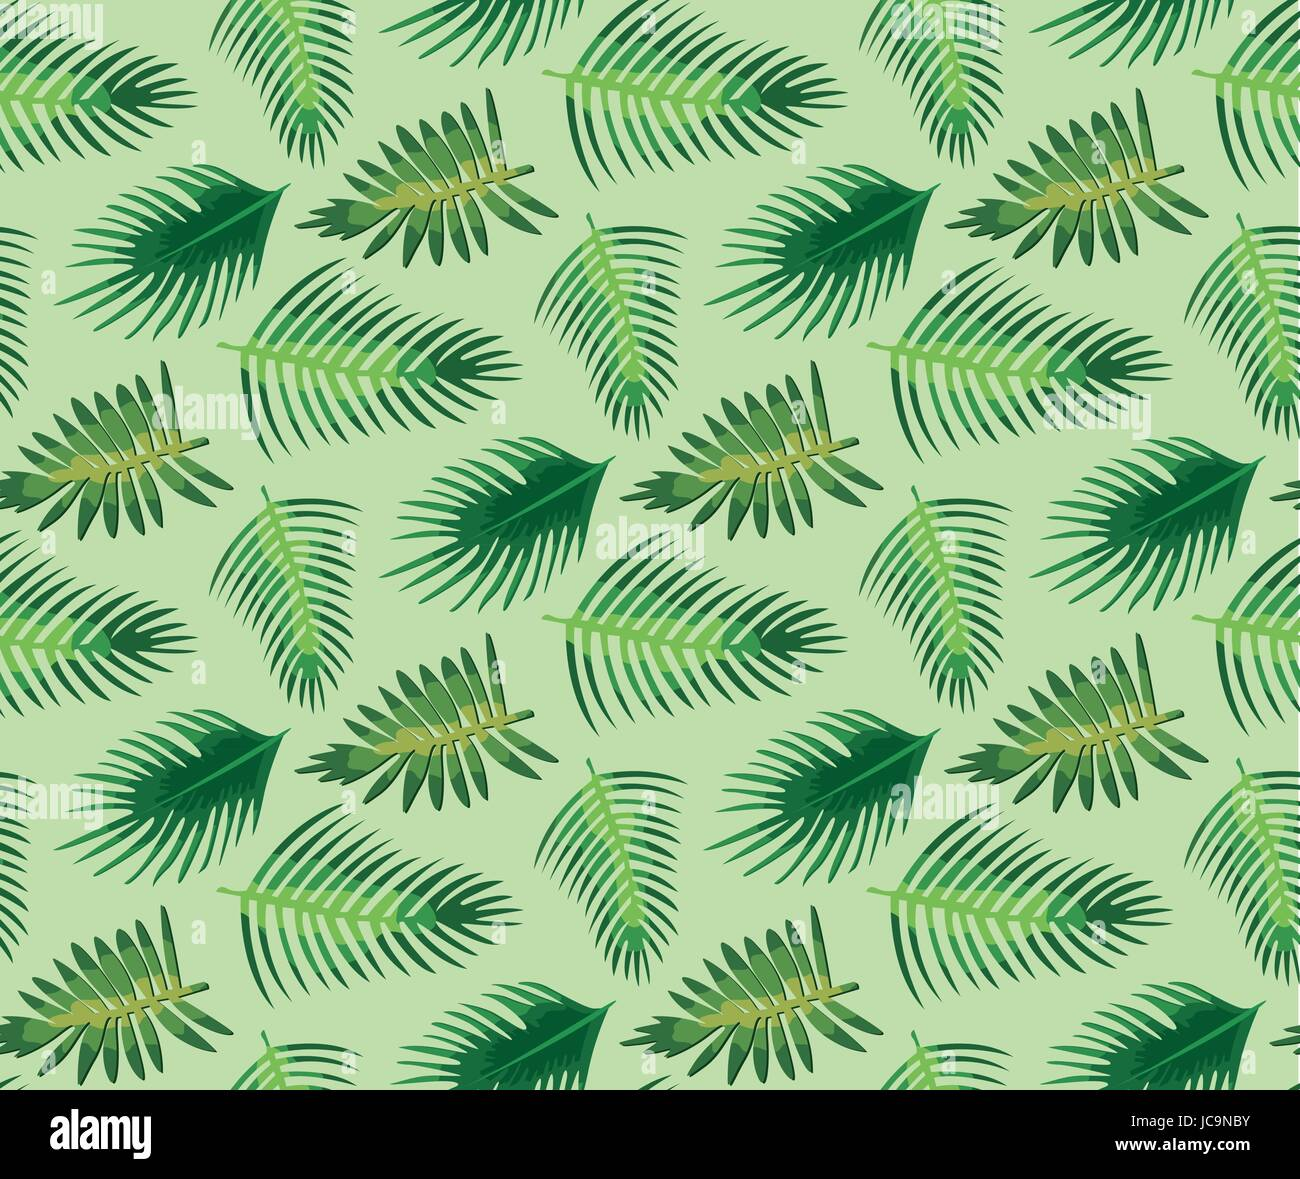 Palm tree different set leaf leaves seamless pattern